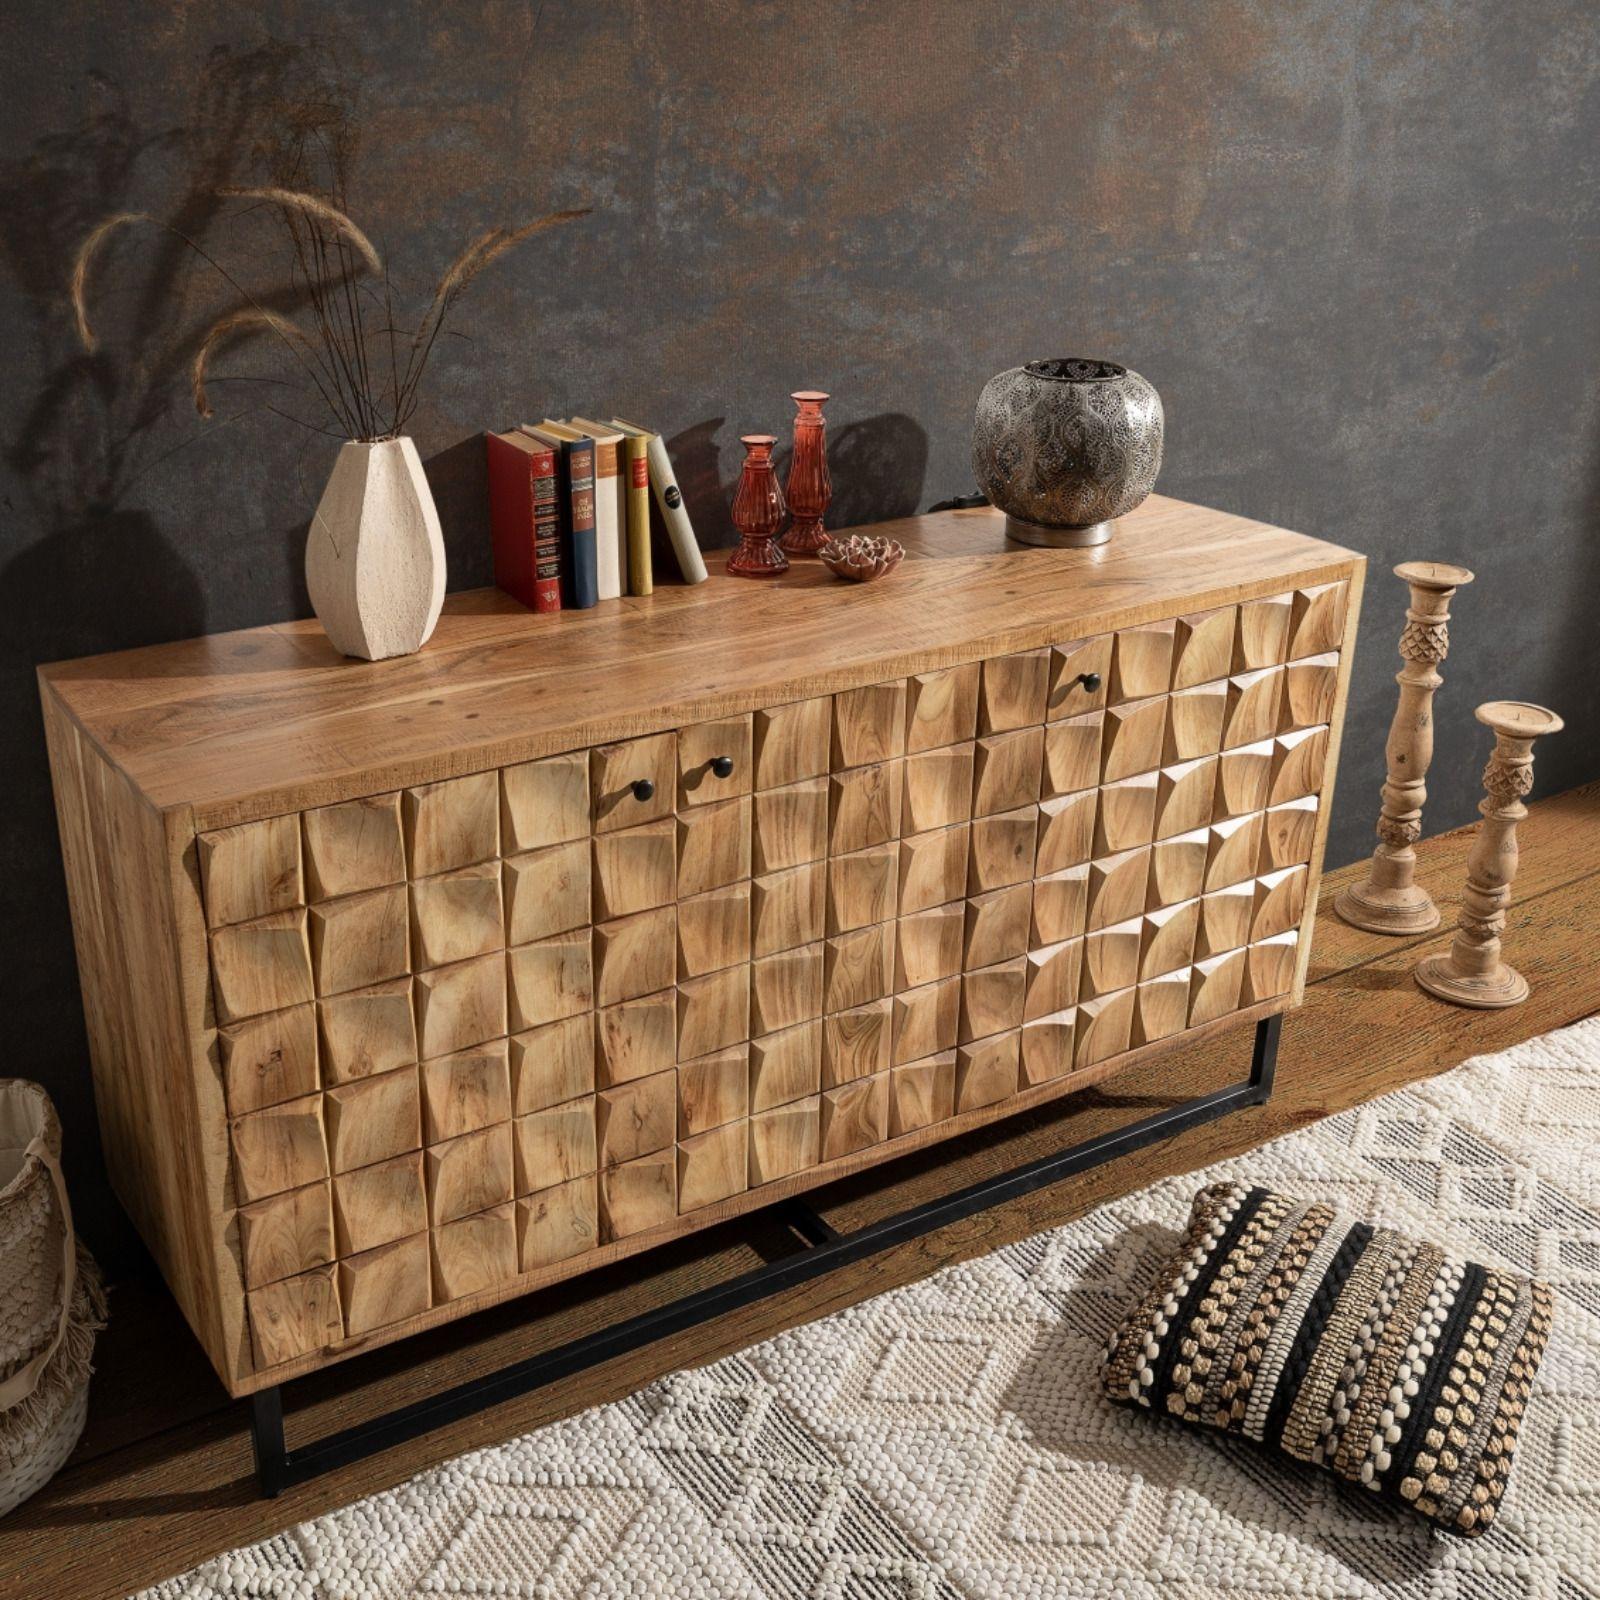 STILMÖBEL | Massiv möbel, Holz, Akazienholz